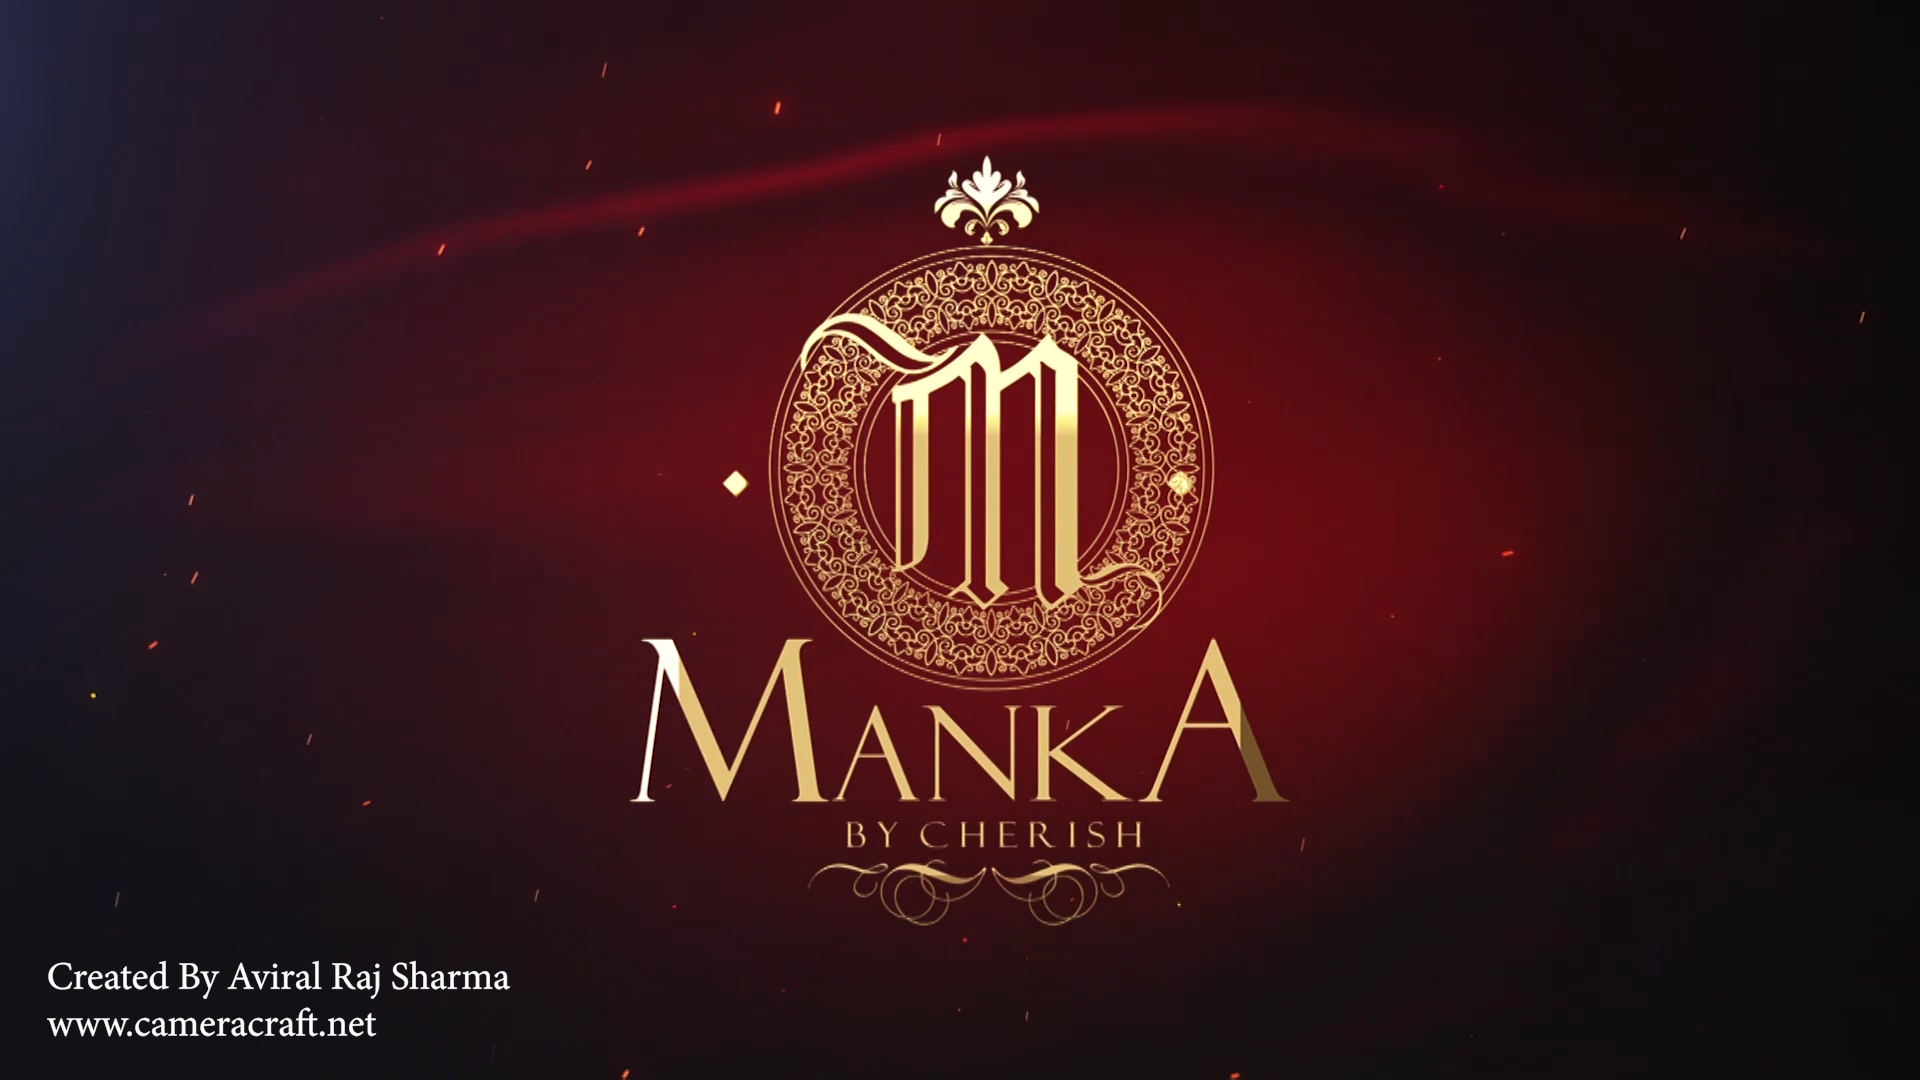 Manka By Cherish - camera-craft